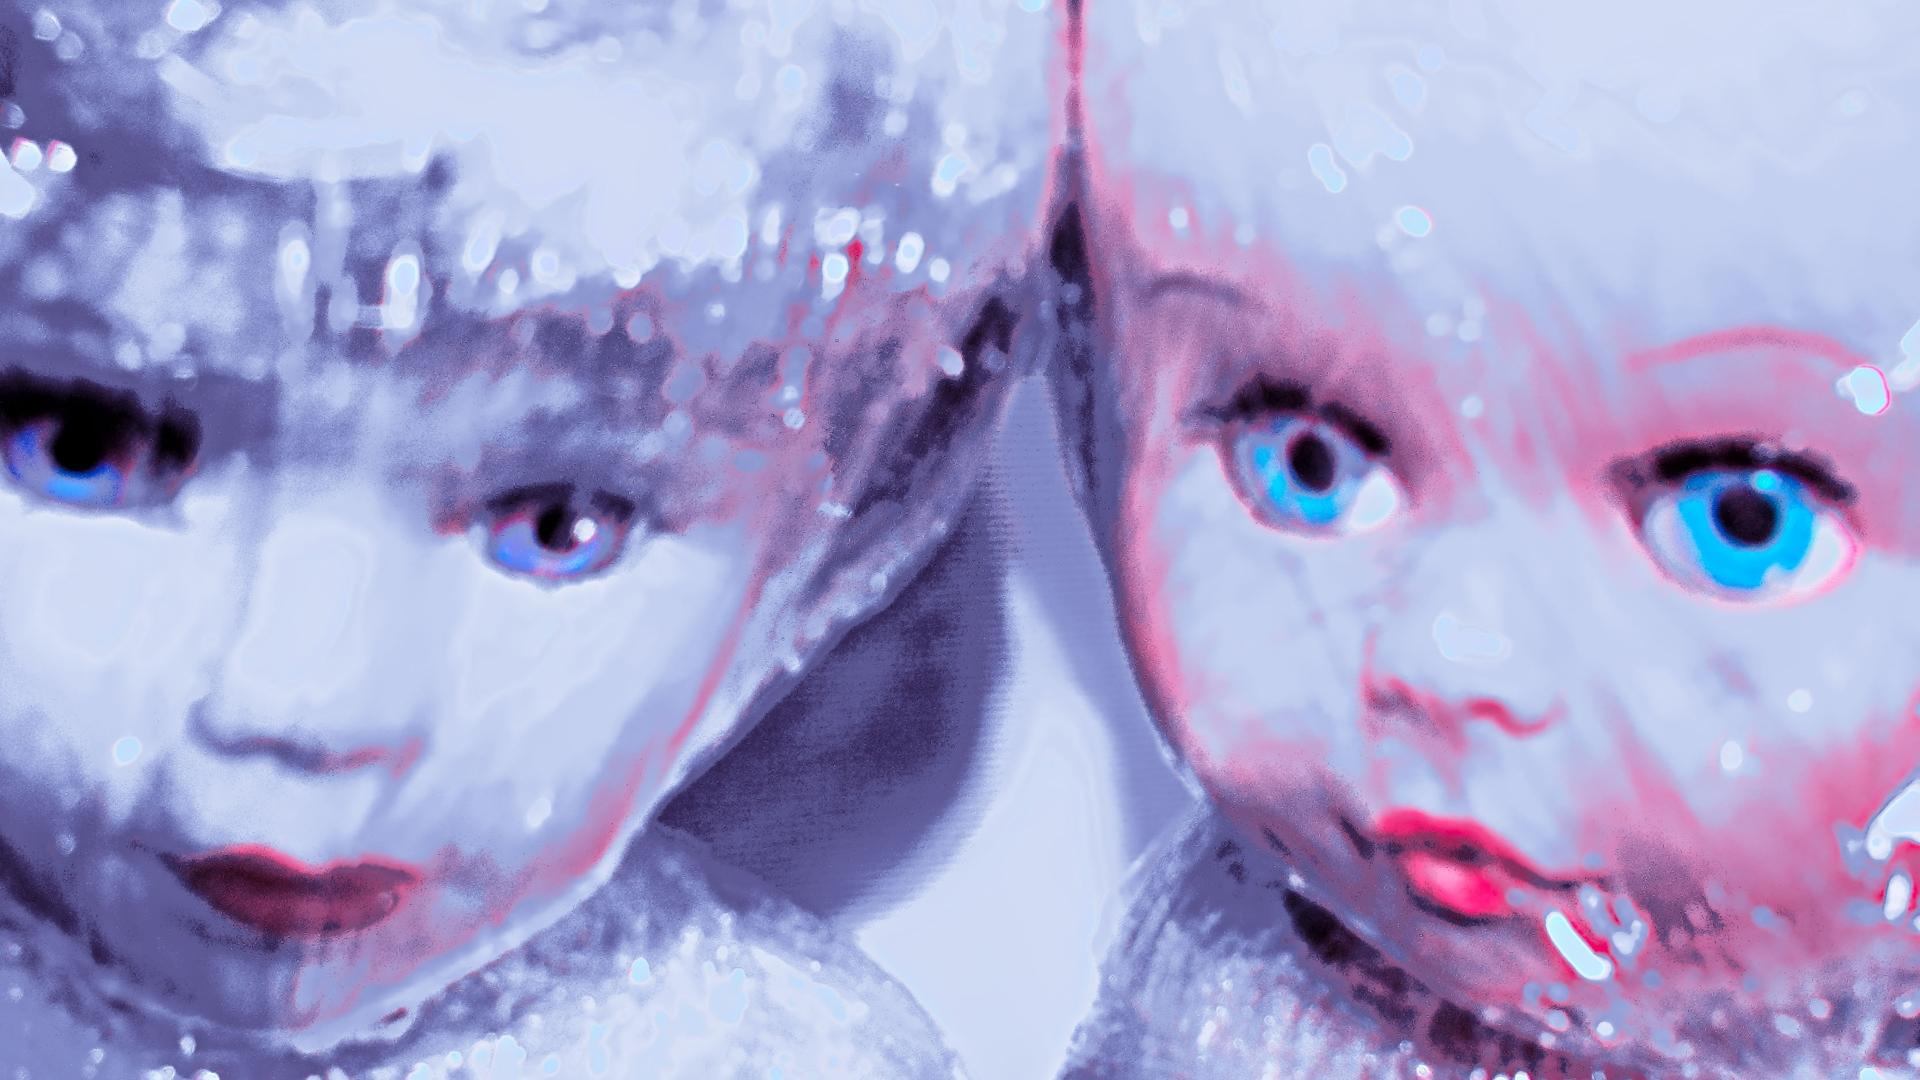 2 dolls image